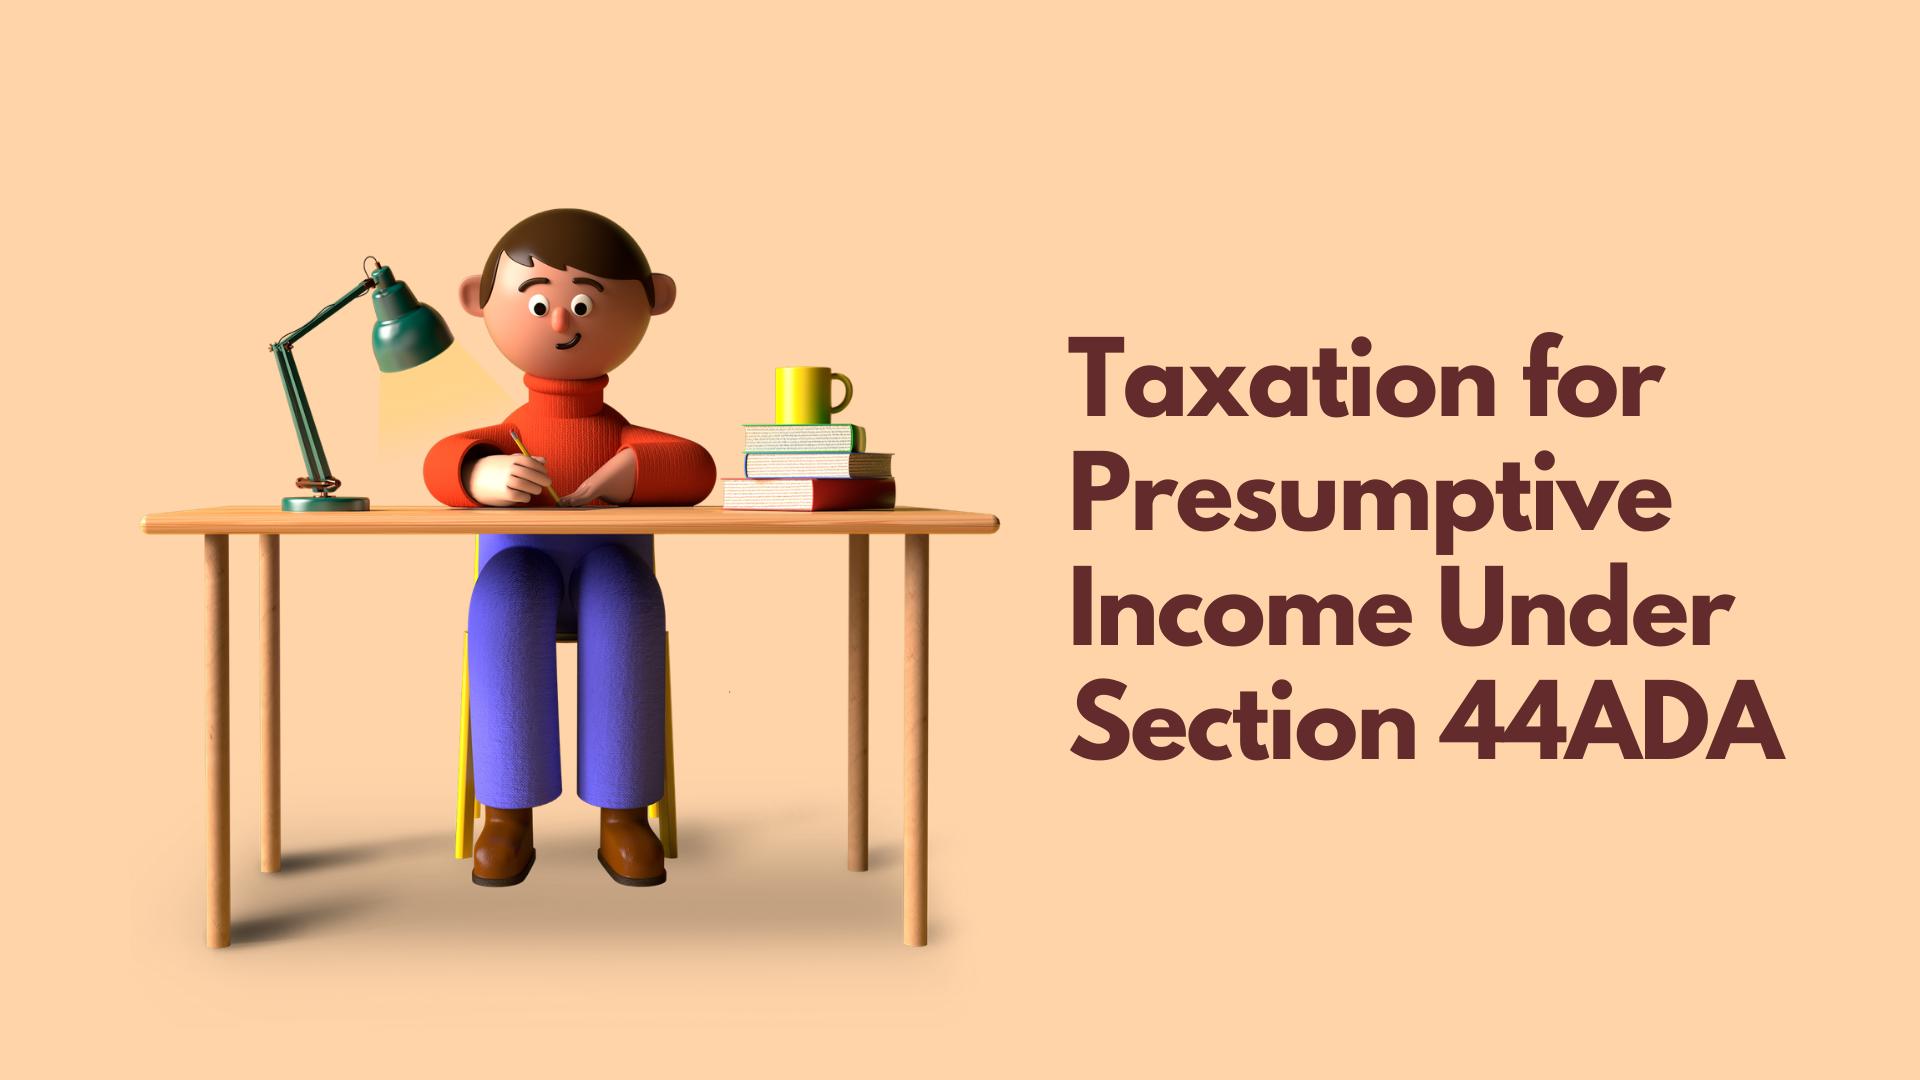 Taxation for Presumptive Income for professionals 44ADA